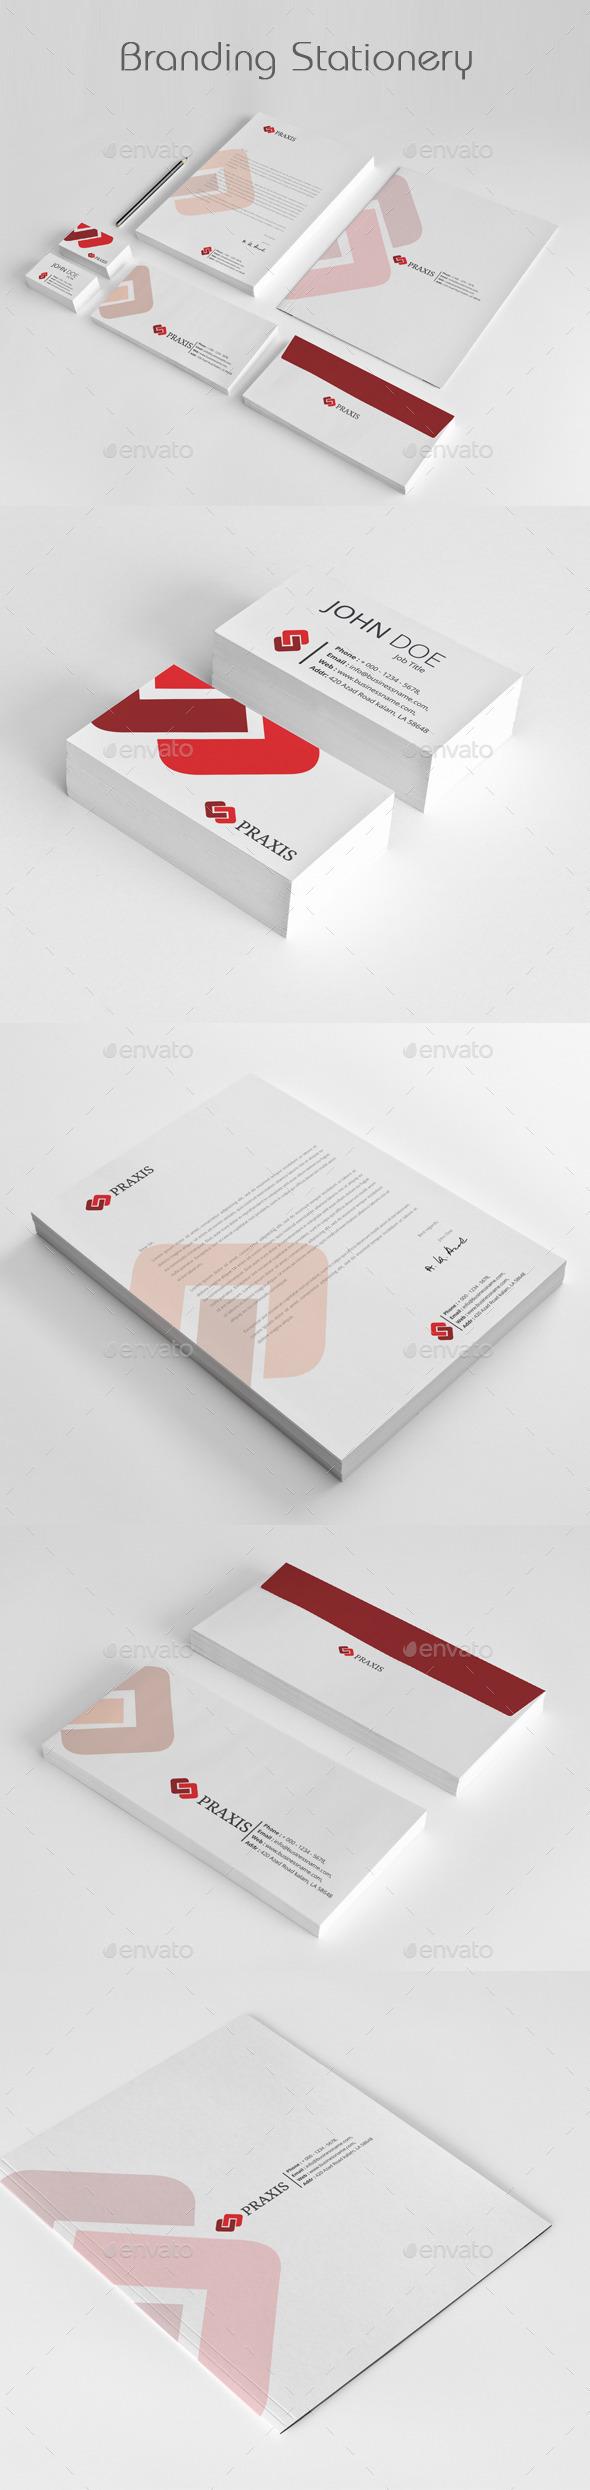 GraphicRiver Branding Stationery Templates 11907005